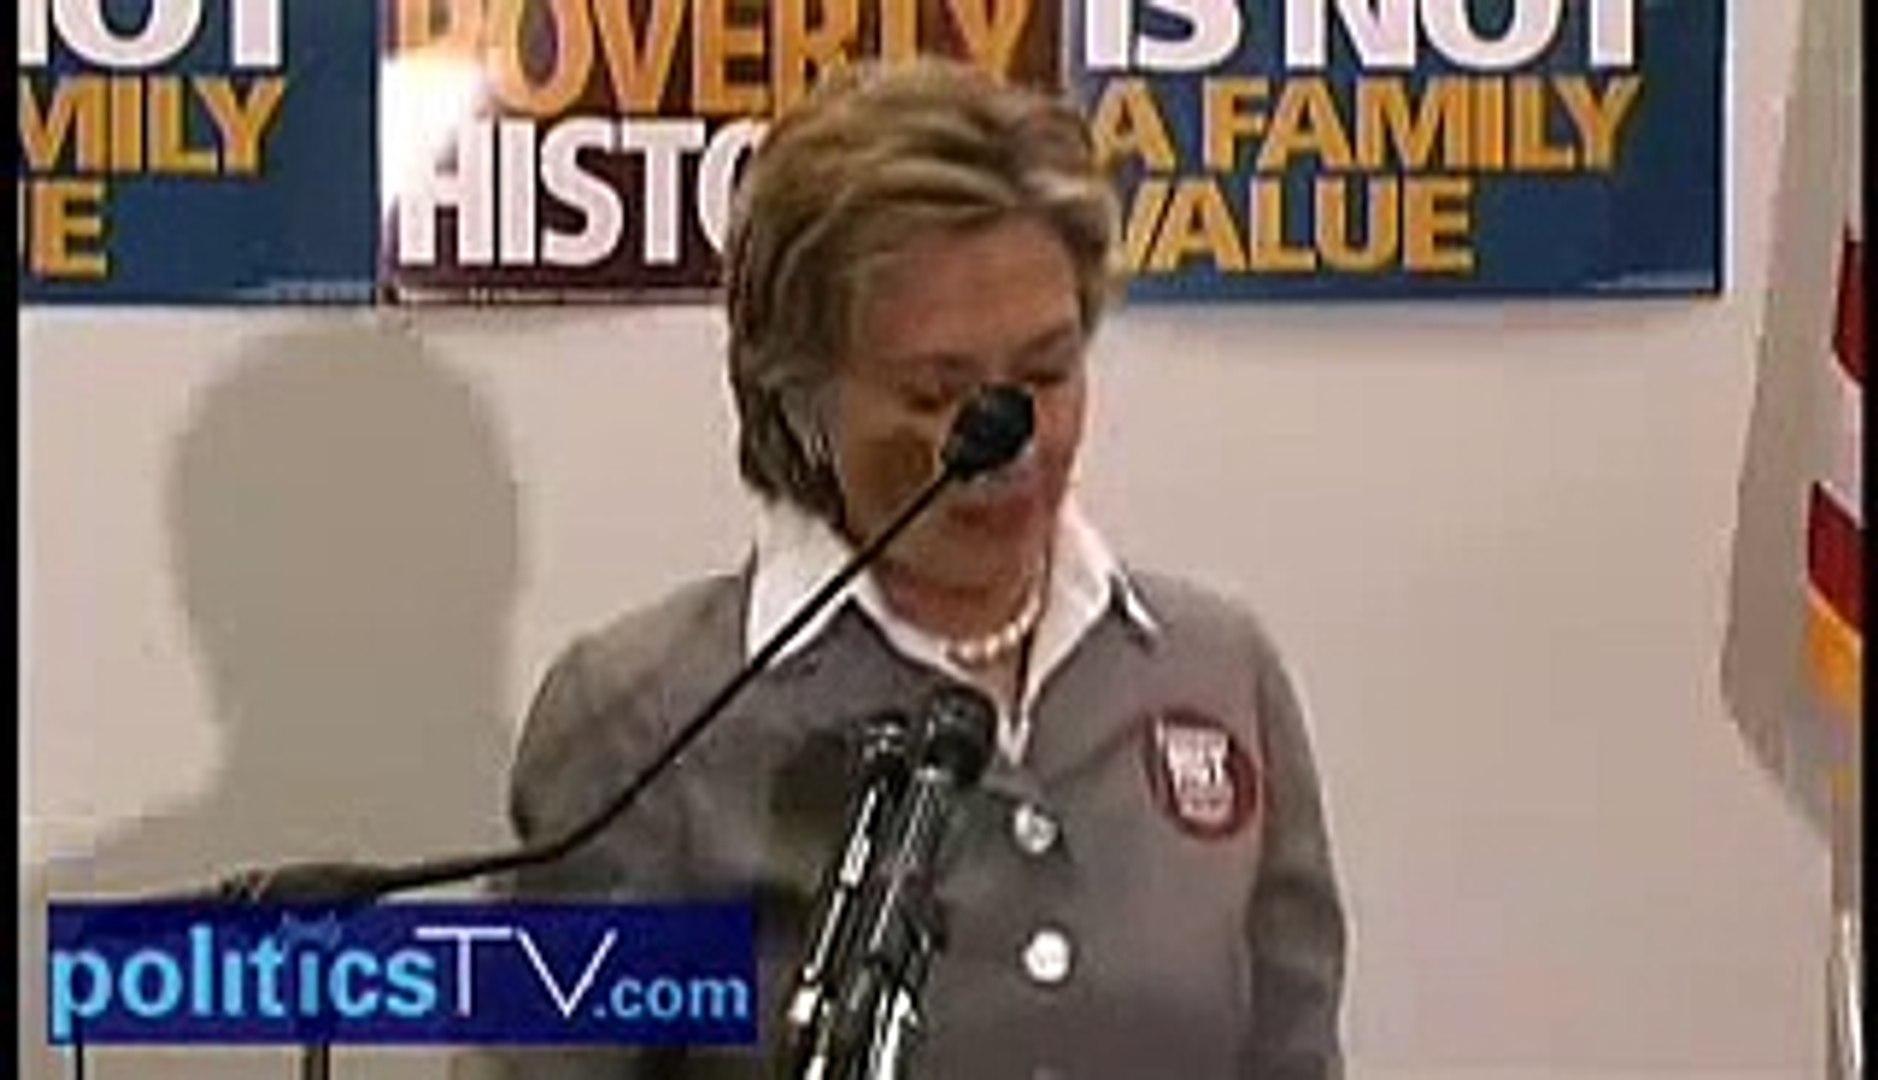 Hillary Clinton addresses progressive religious activists